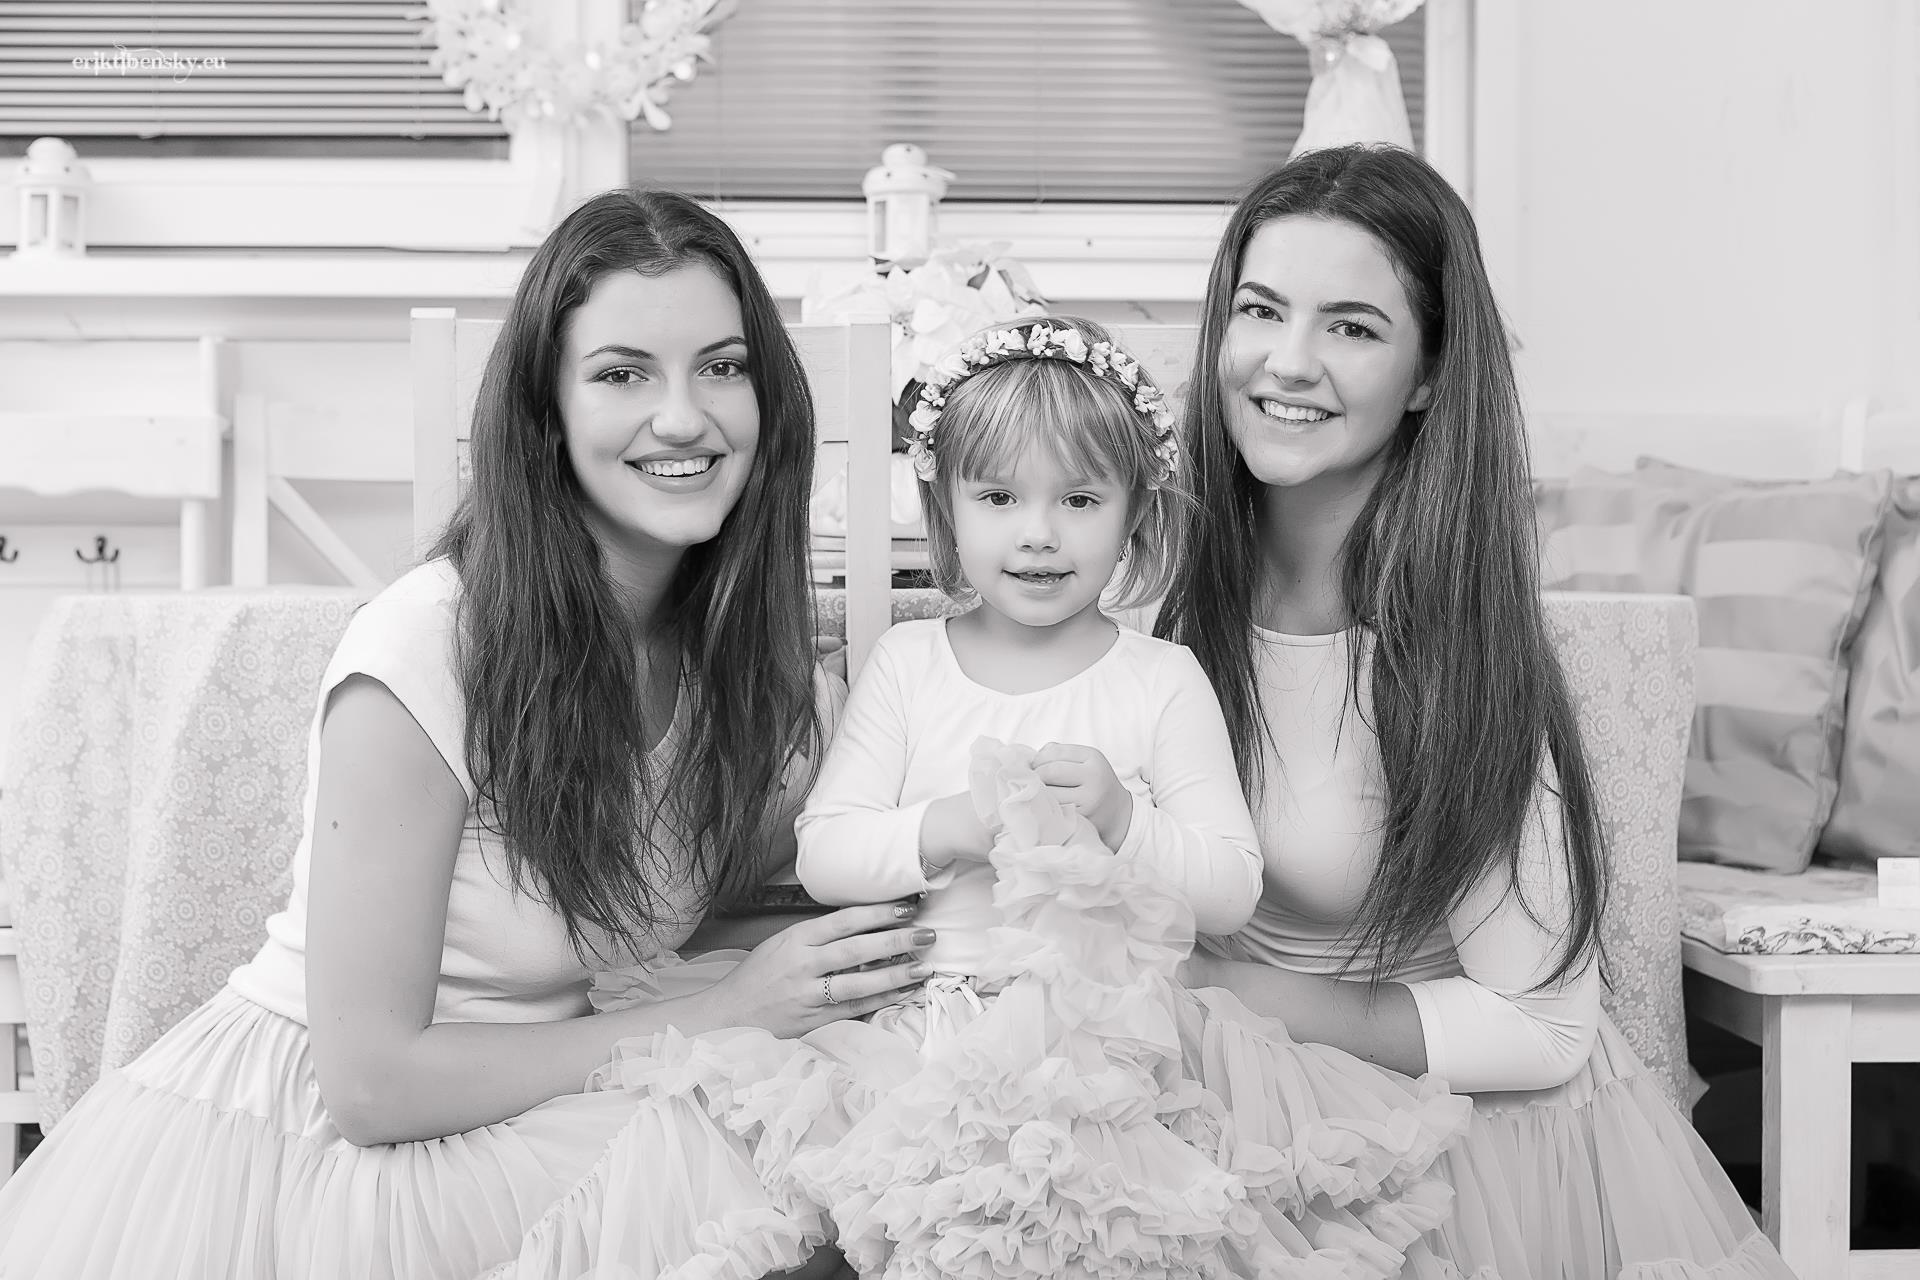 eriktibensky-eu-fotograf-home-photo-family-rodina-kids-deti-1016